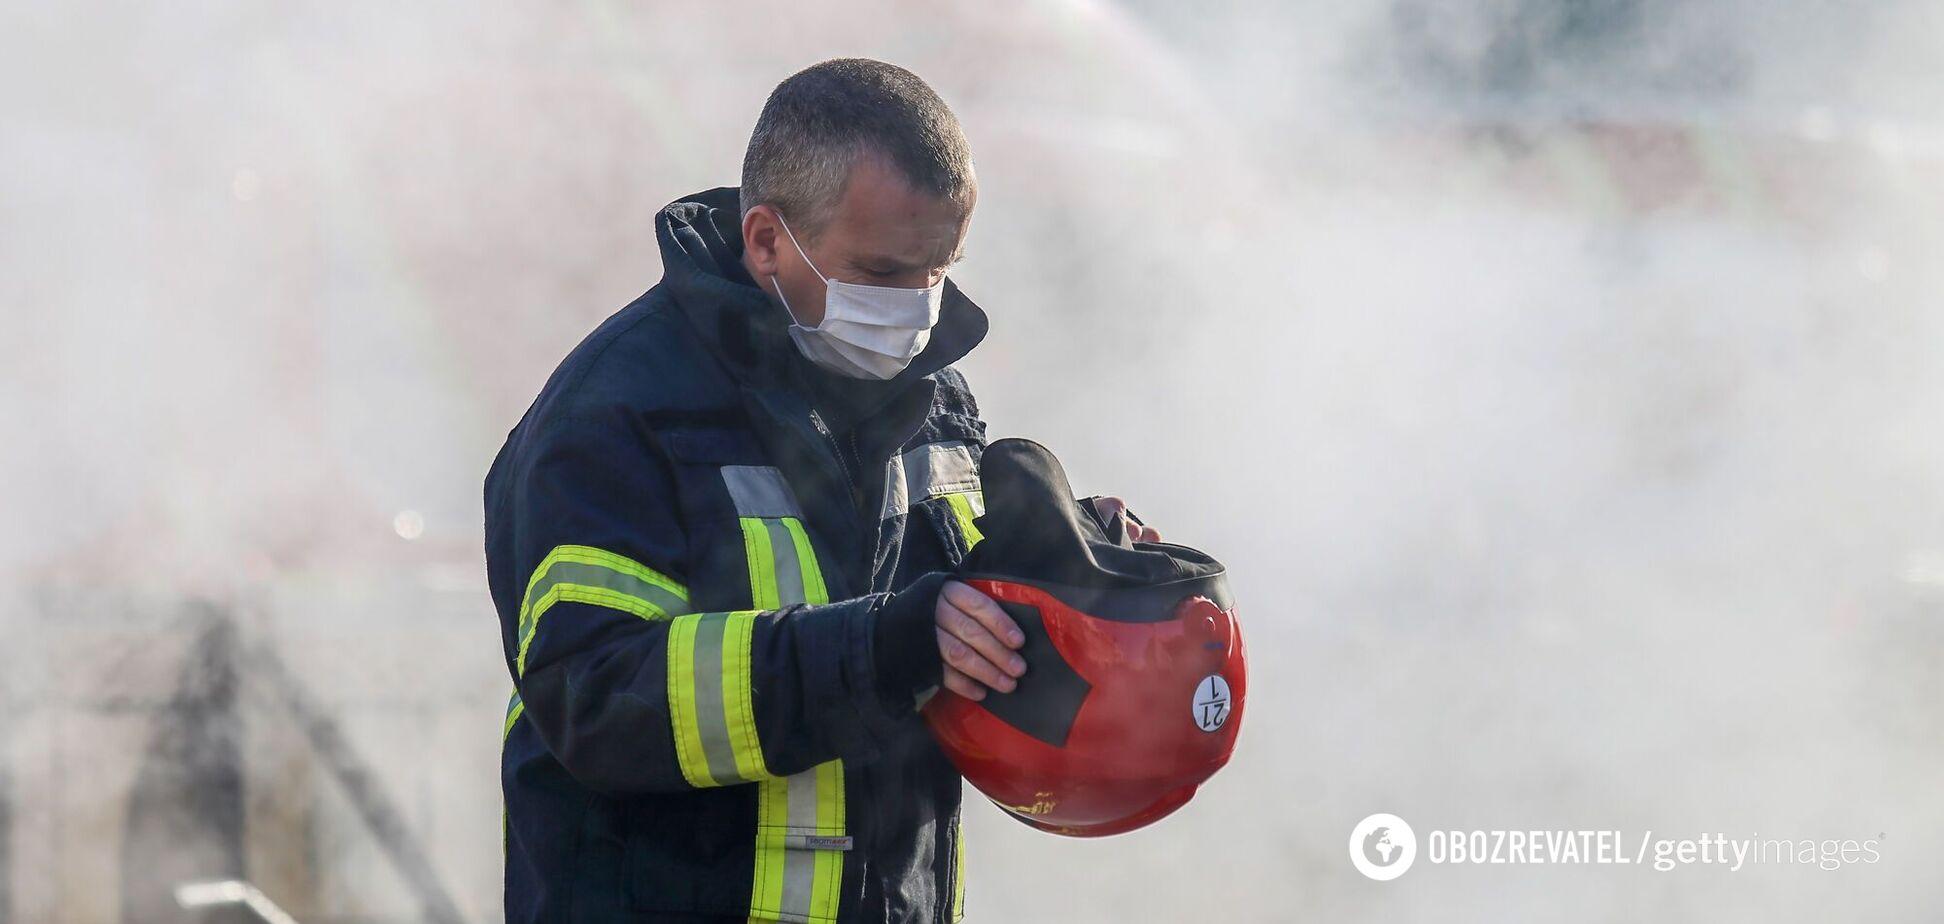 У Києві сталася пожежа в студентському гуртожитку. Відео